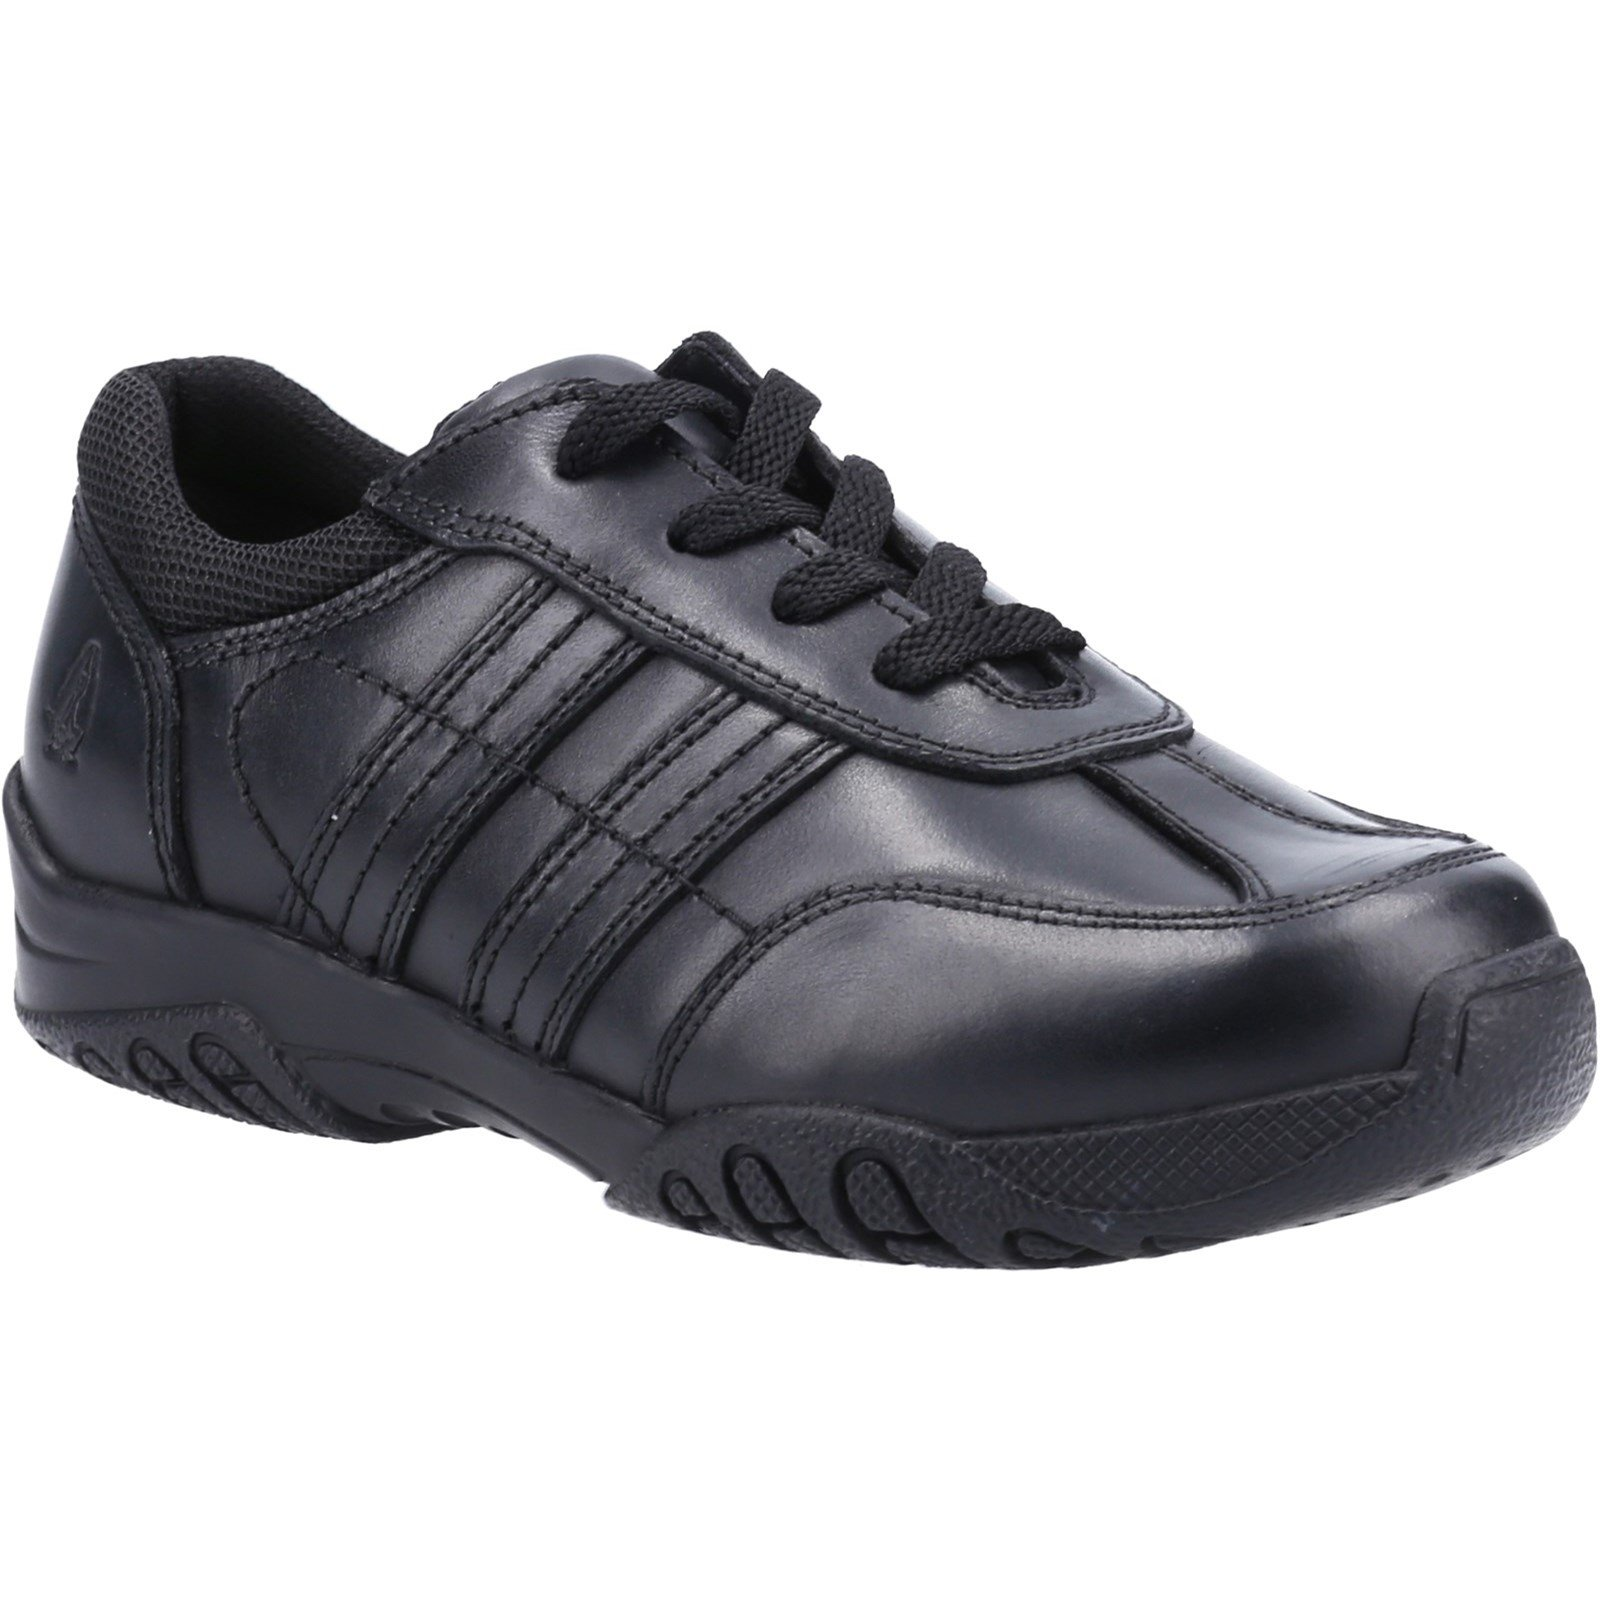 Hush Puppies Kid's Jezza2 Junior School Shoe Black 32606 - Black 2